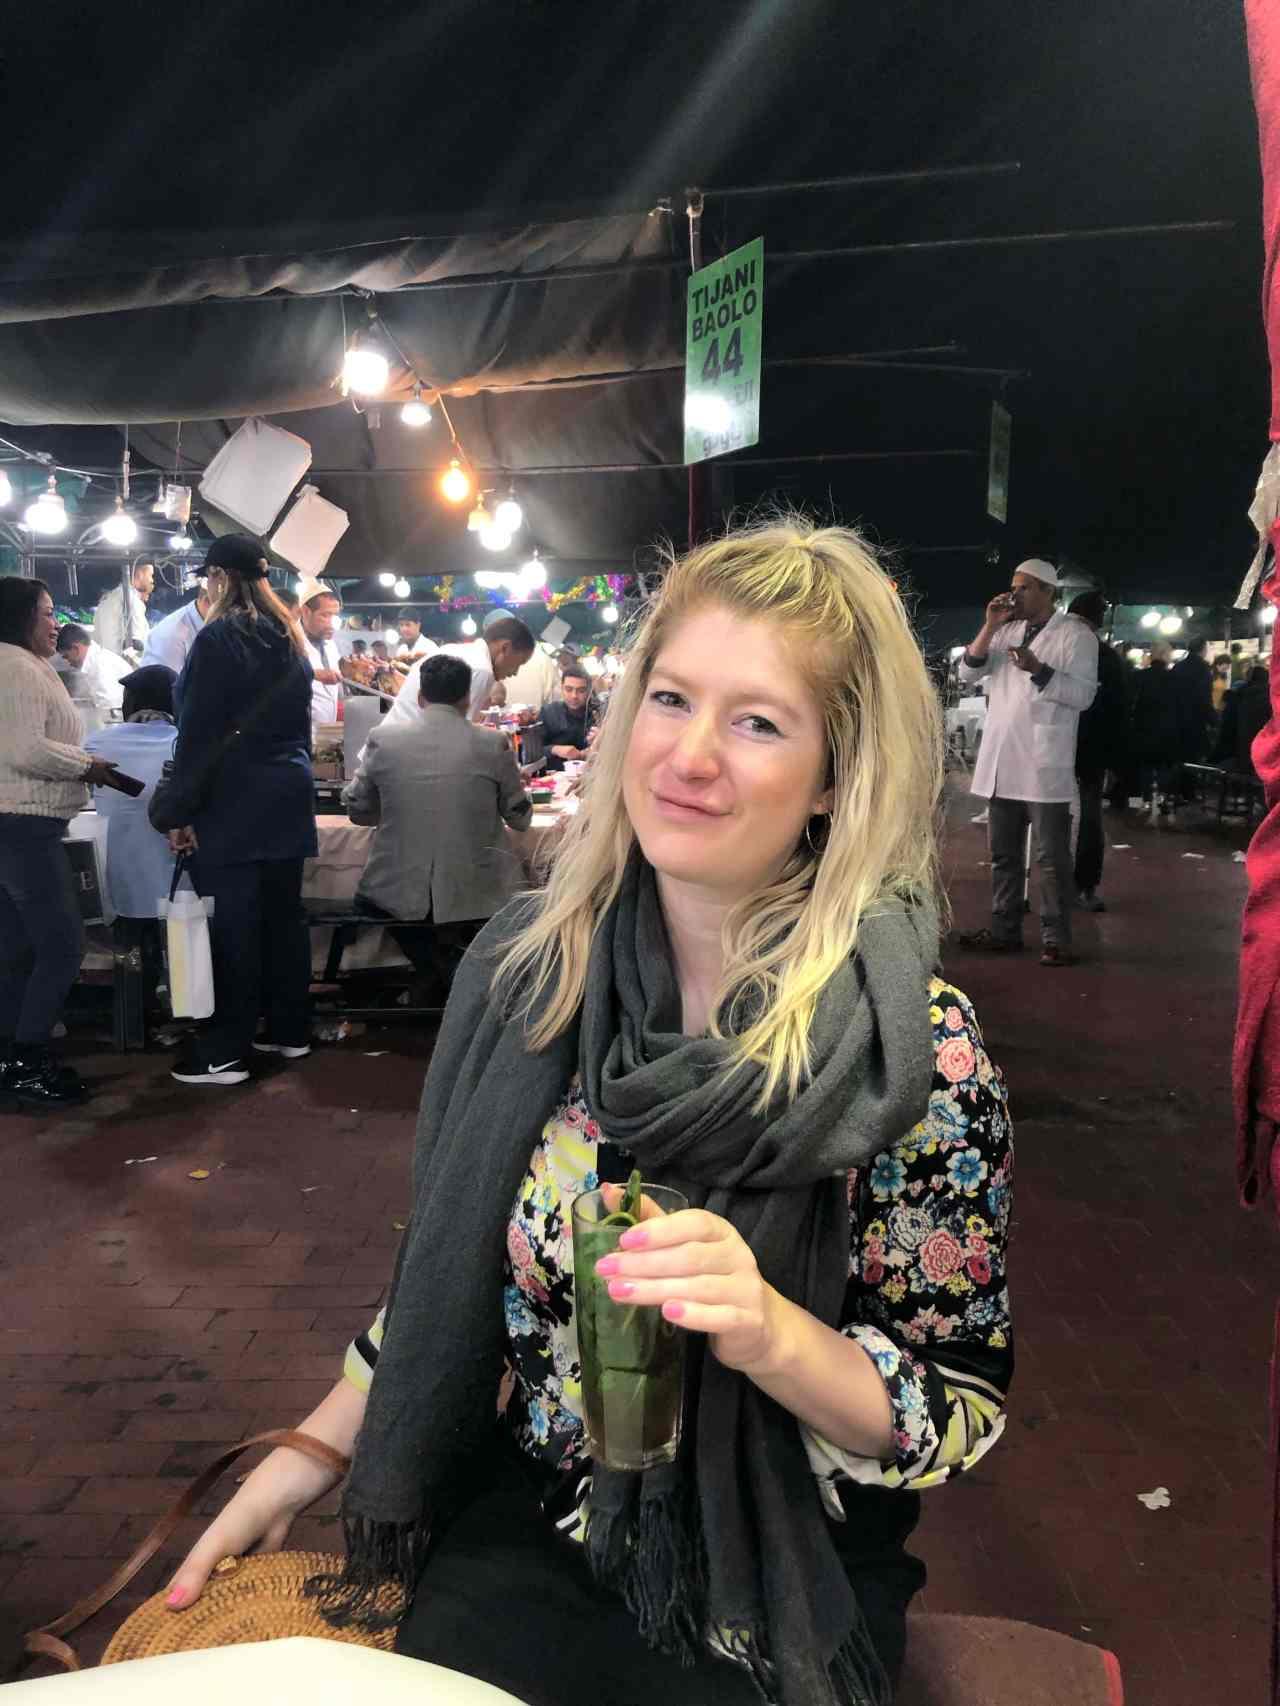 Marrakech main square night market